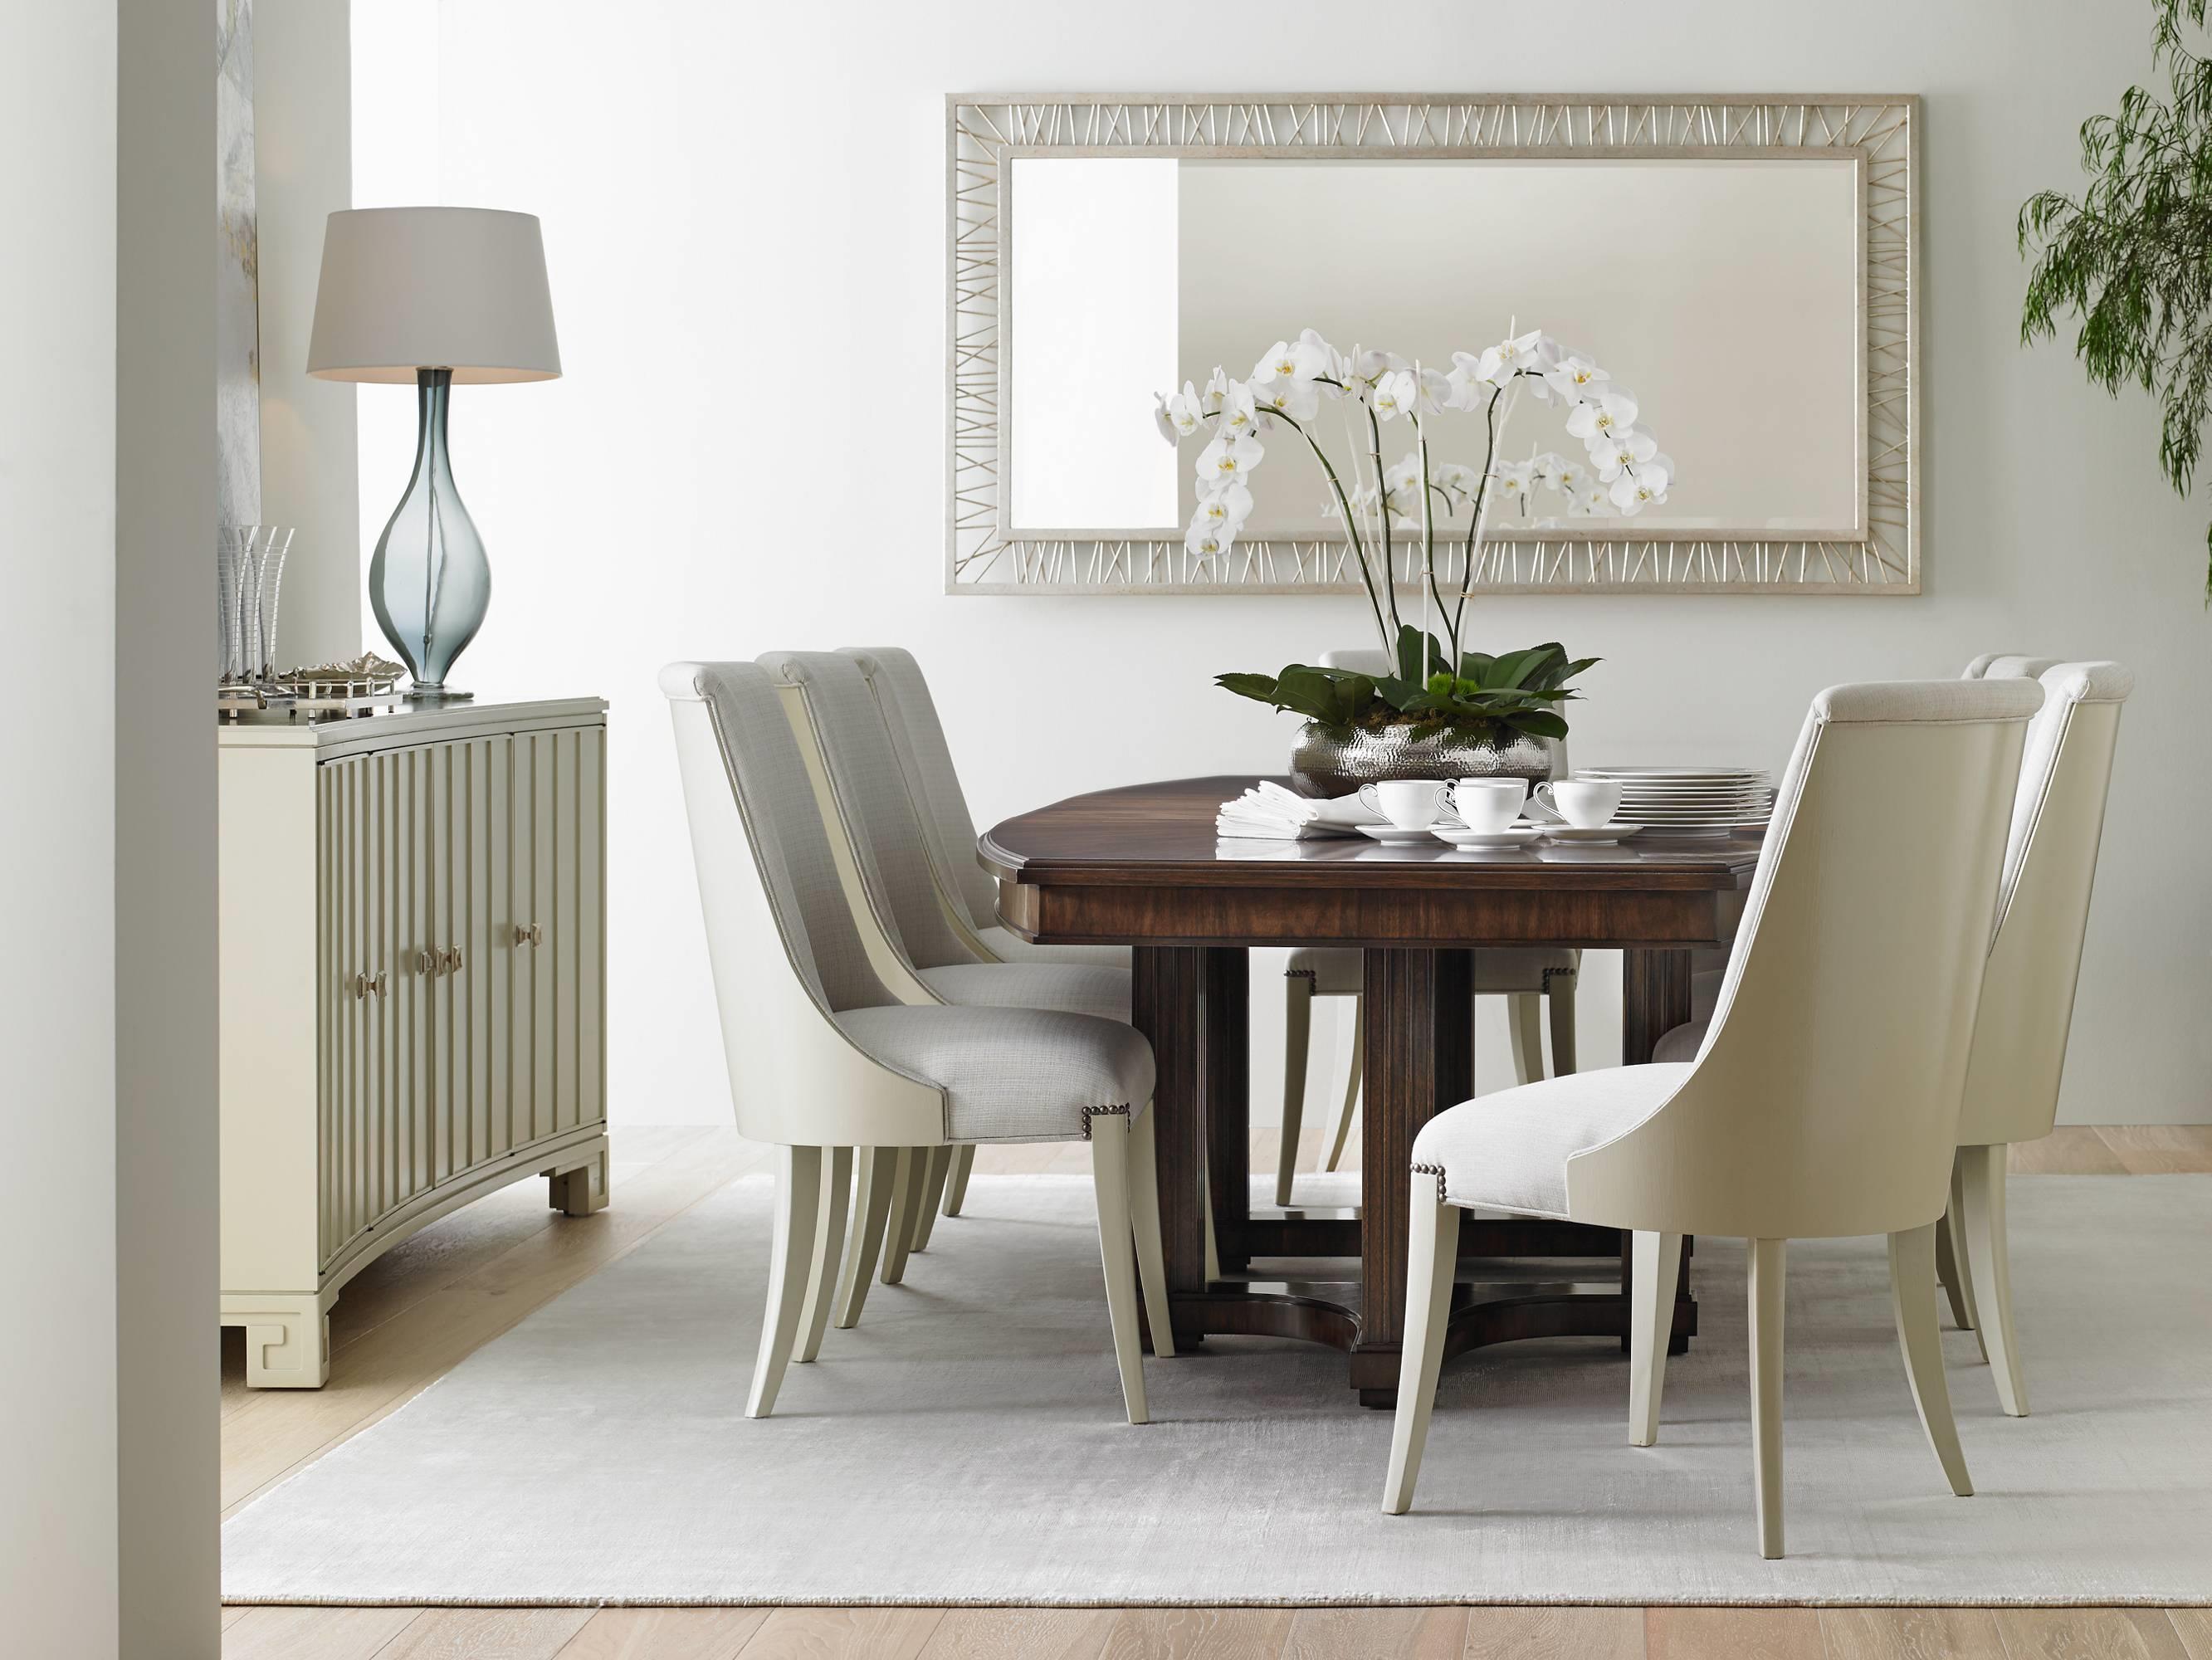 Stanley Furniture Crestaire Formal Dining Room Group - Item Number: 436-1 Dining Room Group 2